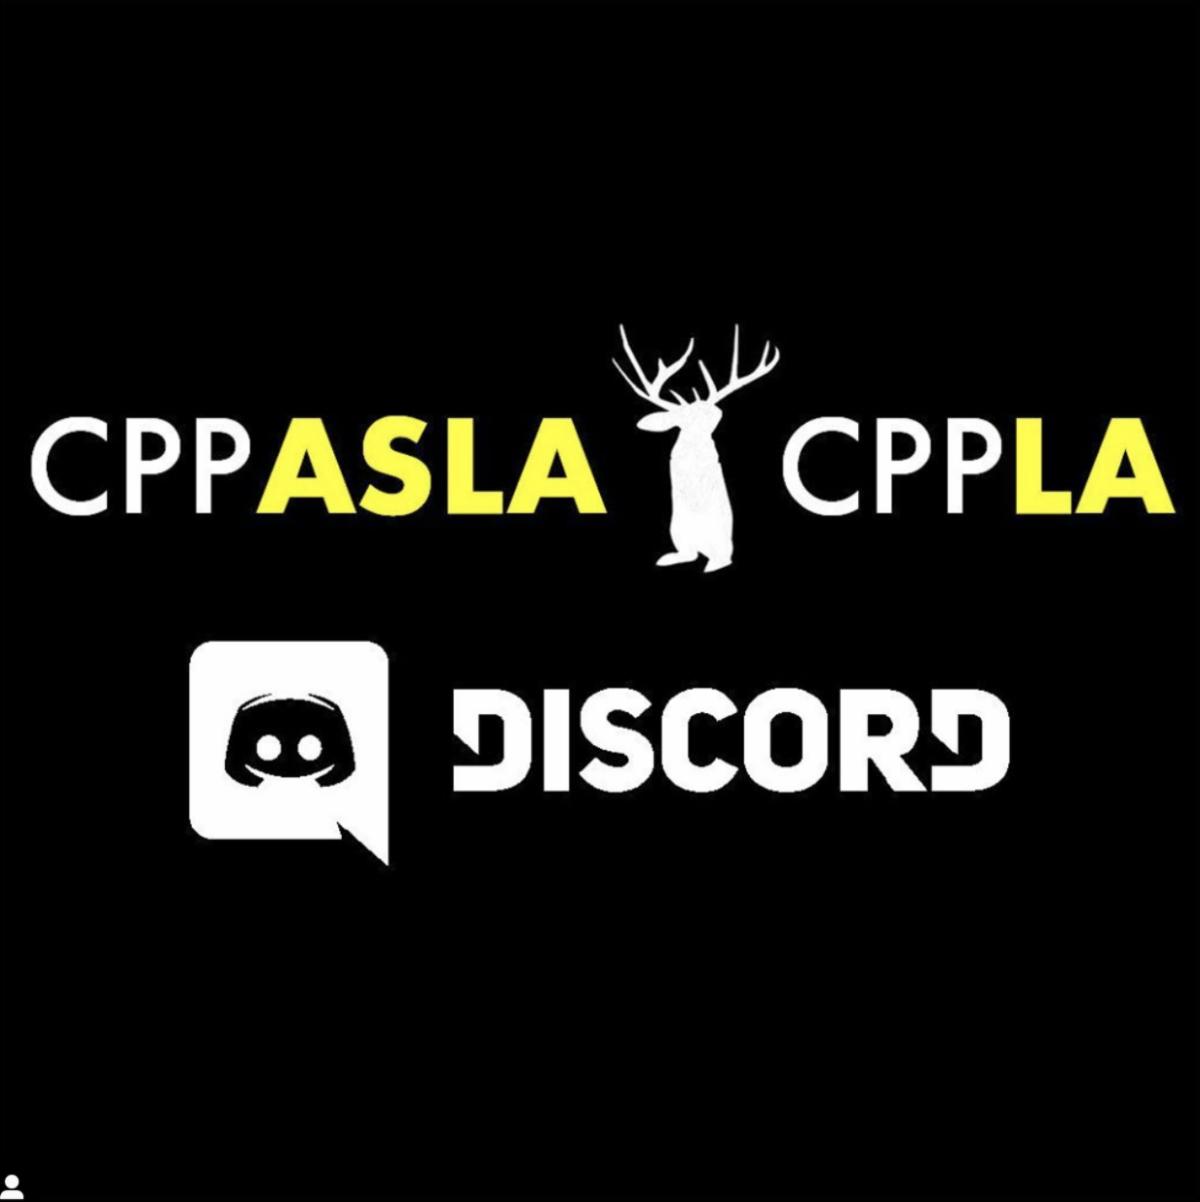 cppasla on discord